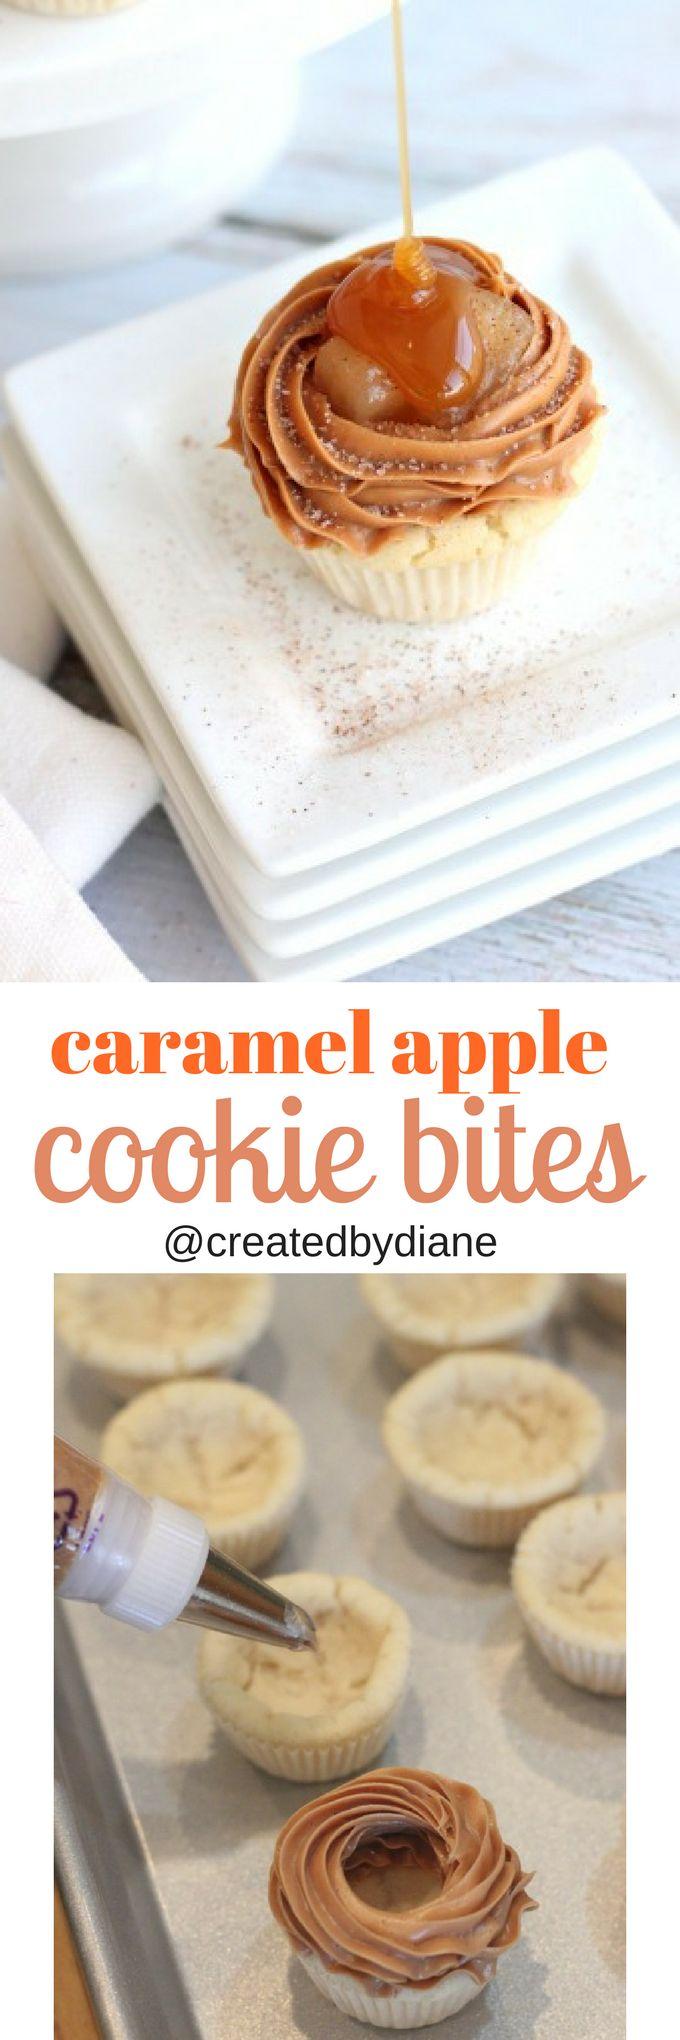 caramel apple cookie bites from @createdbydiane